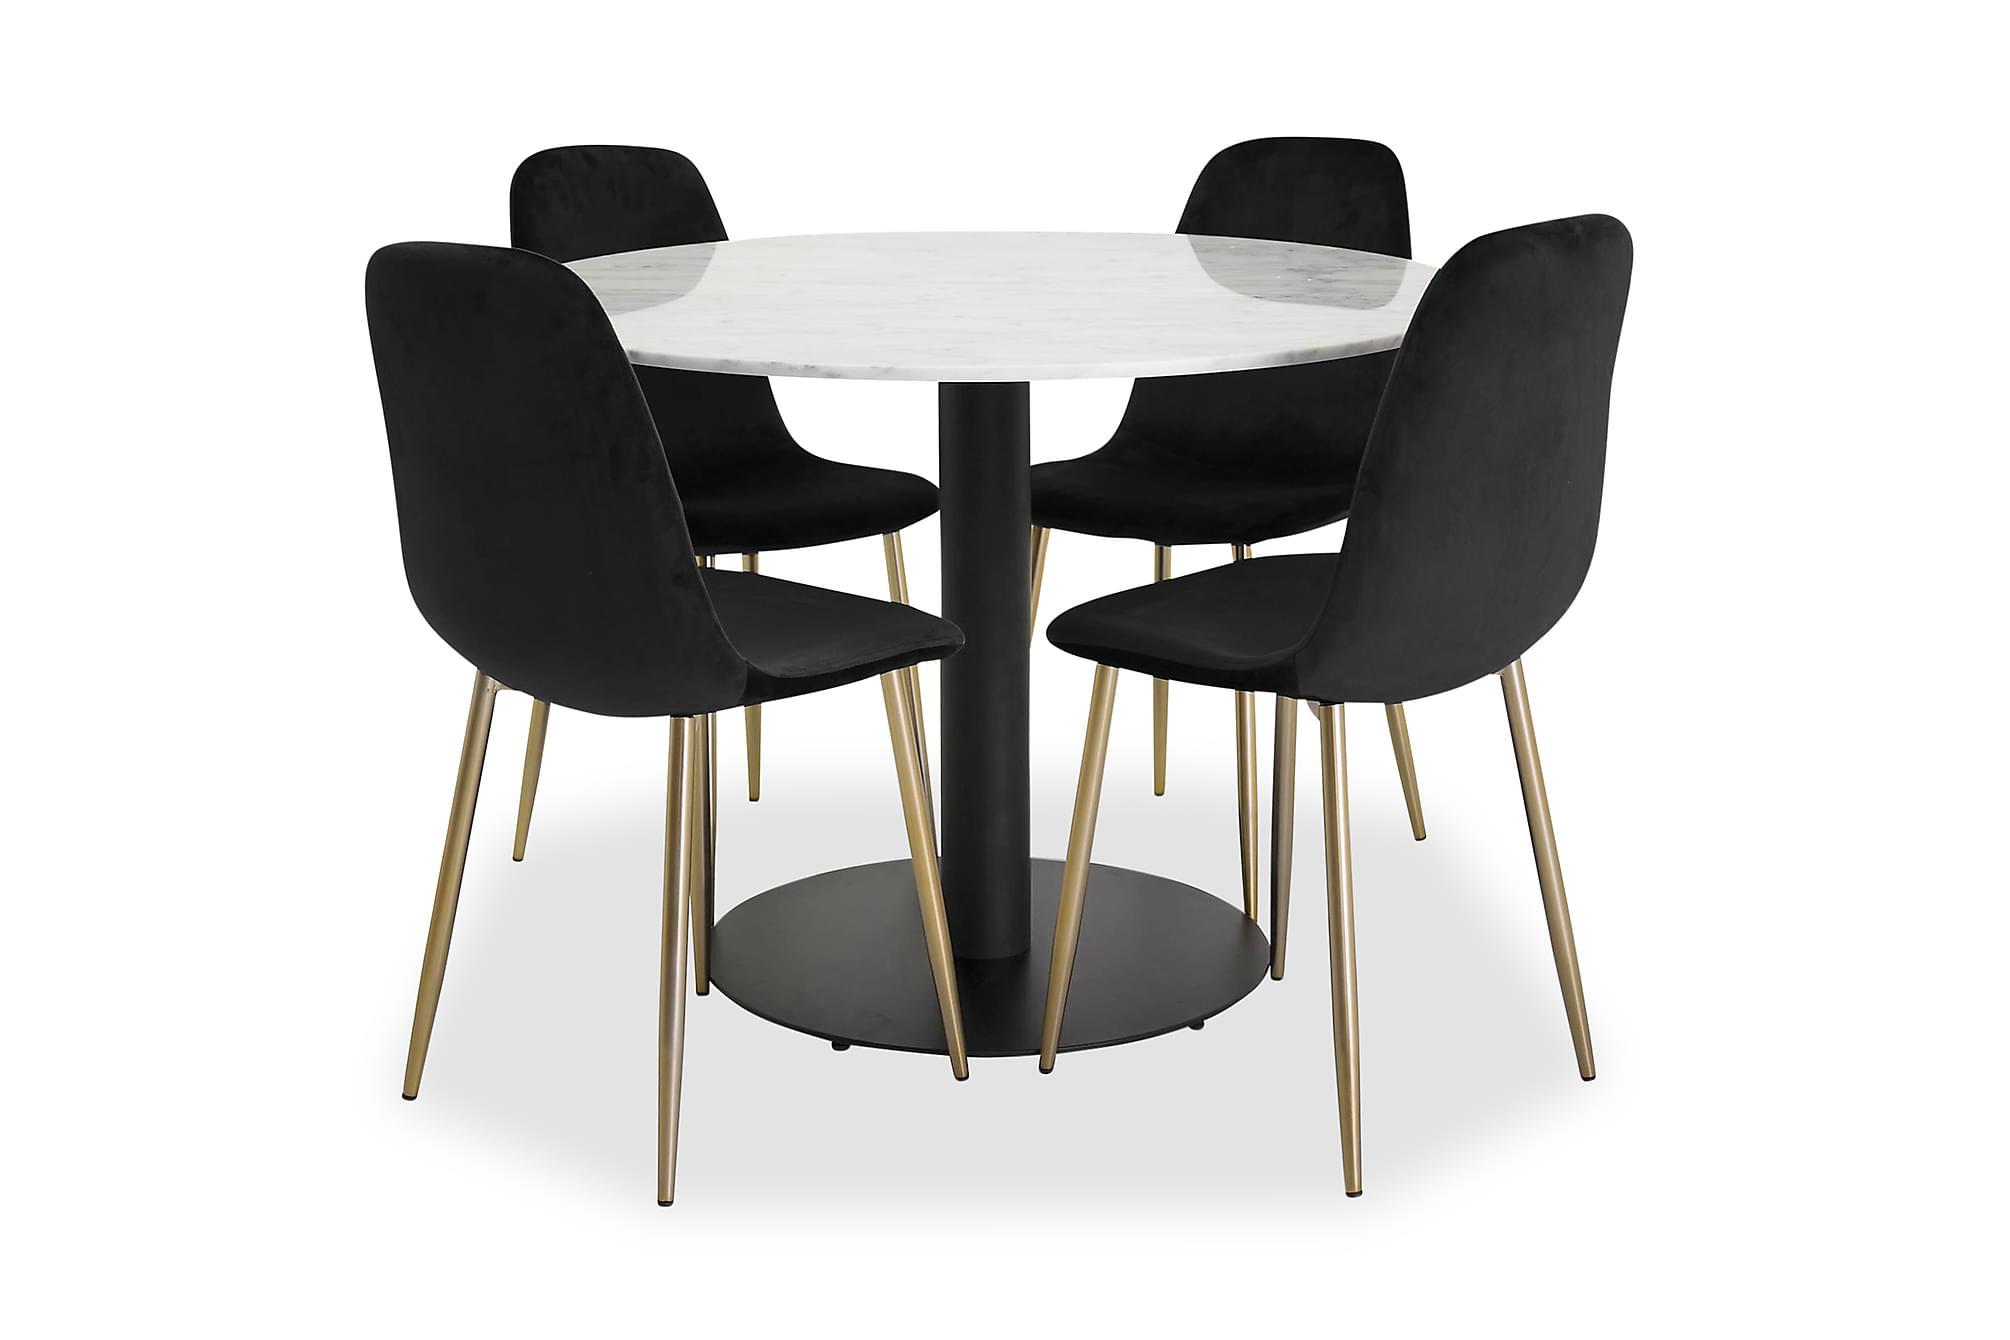 ADMIRA matbord runt vit/svart+Pontus stol svart/mässing 4st, Matgrupper